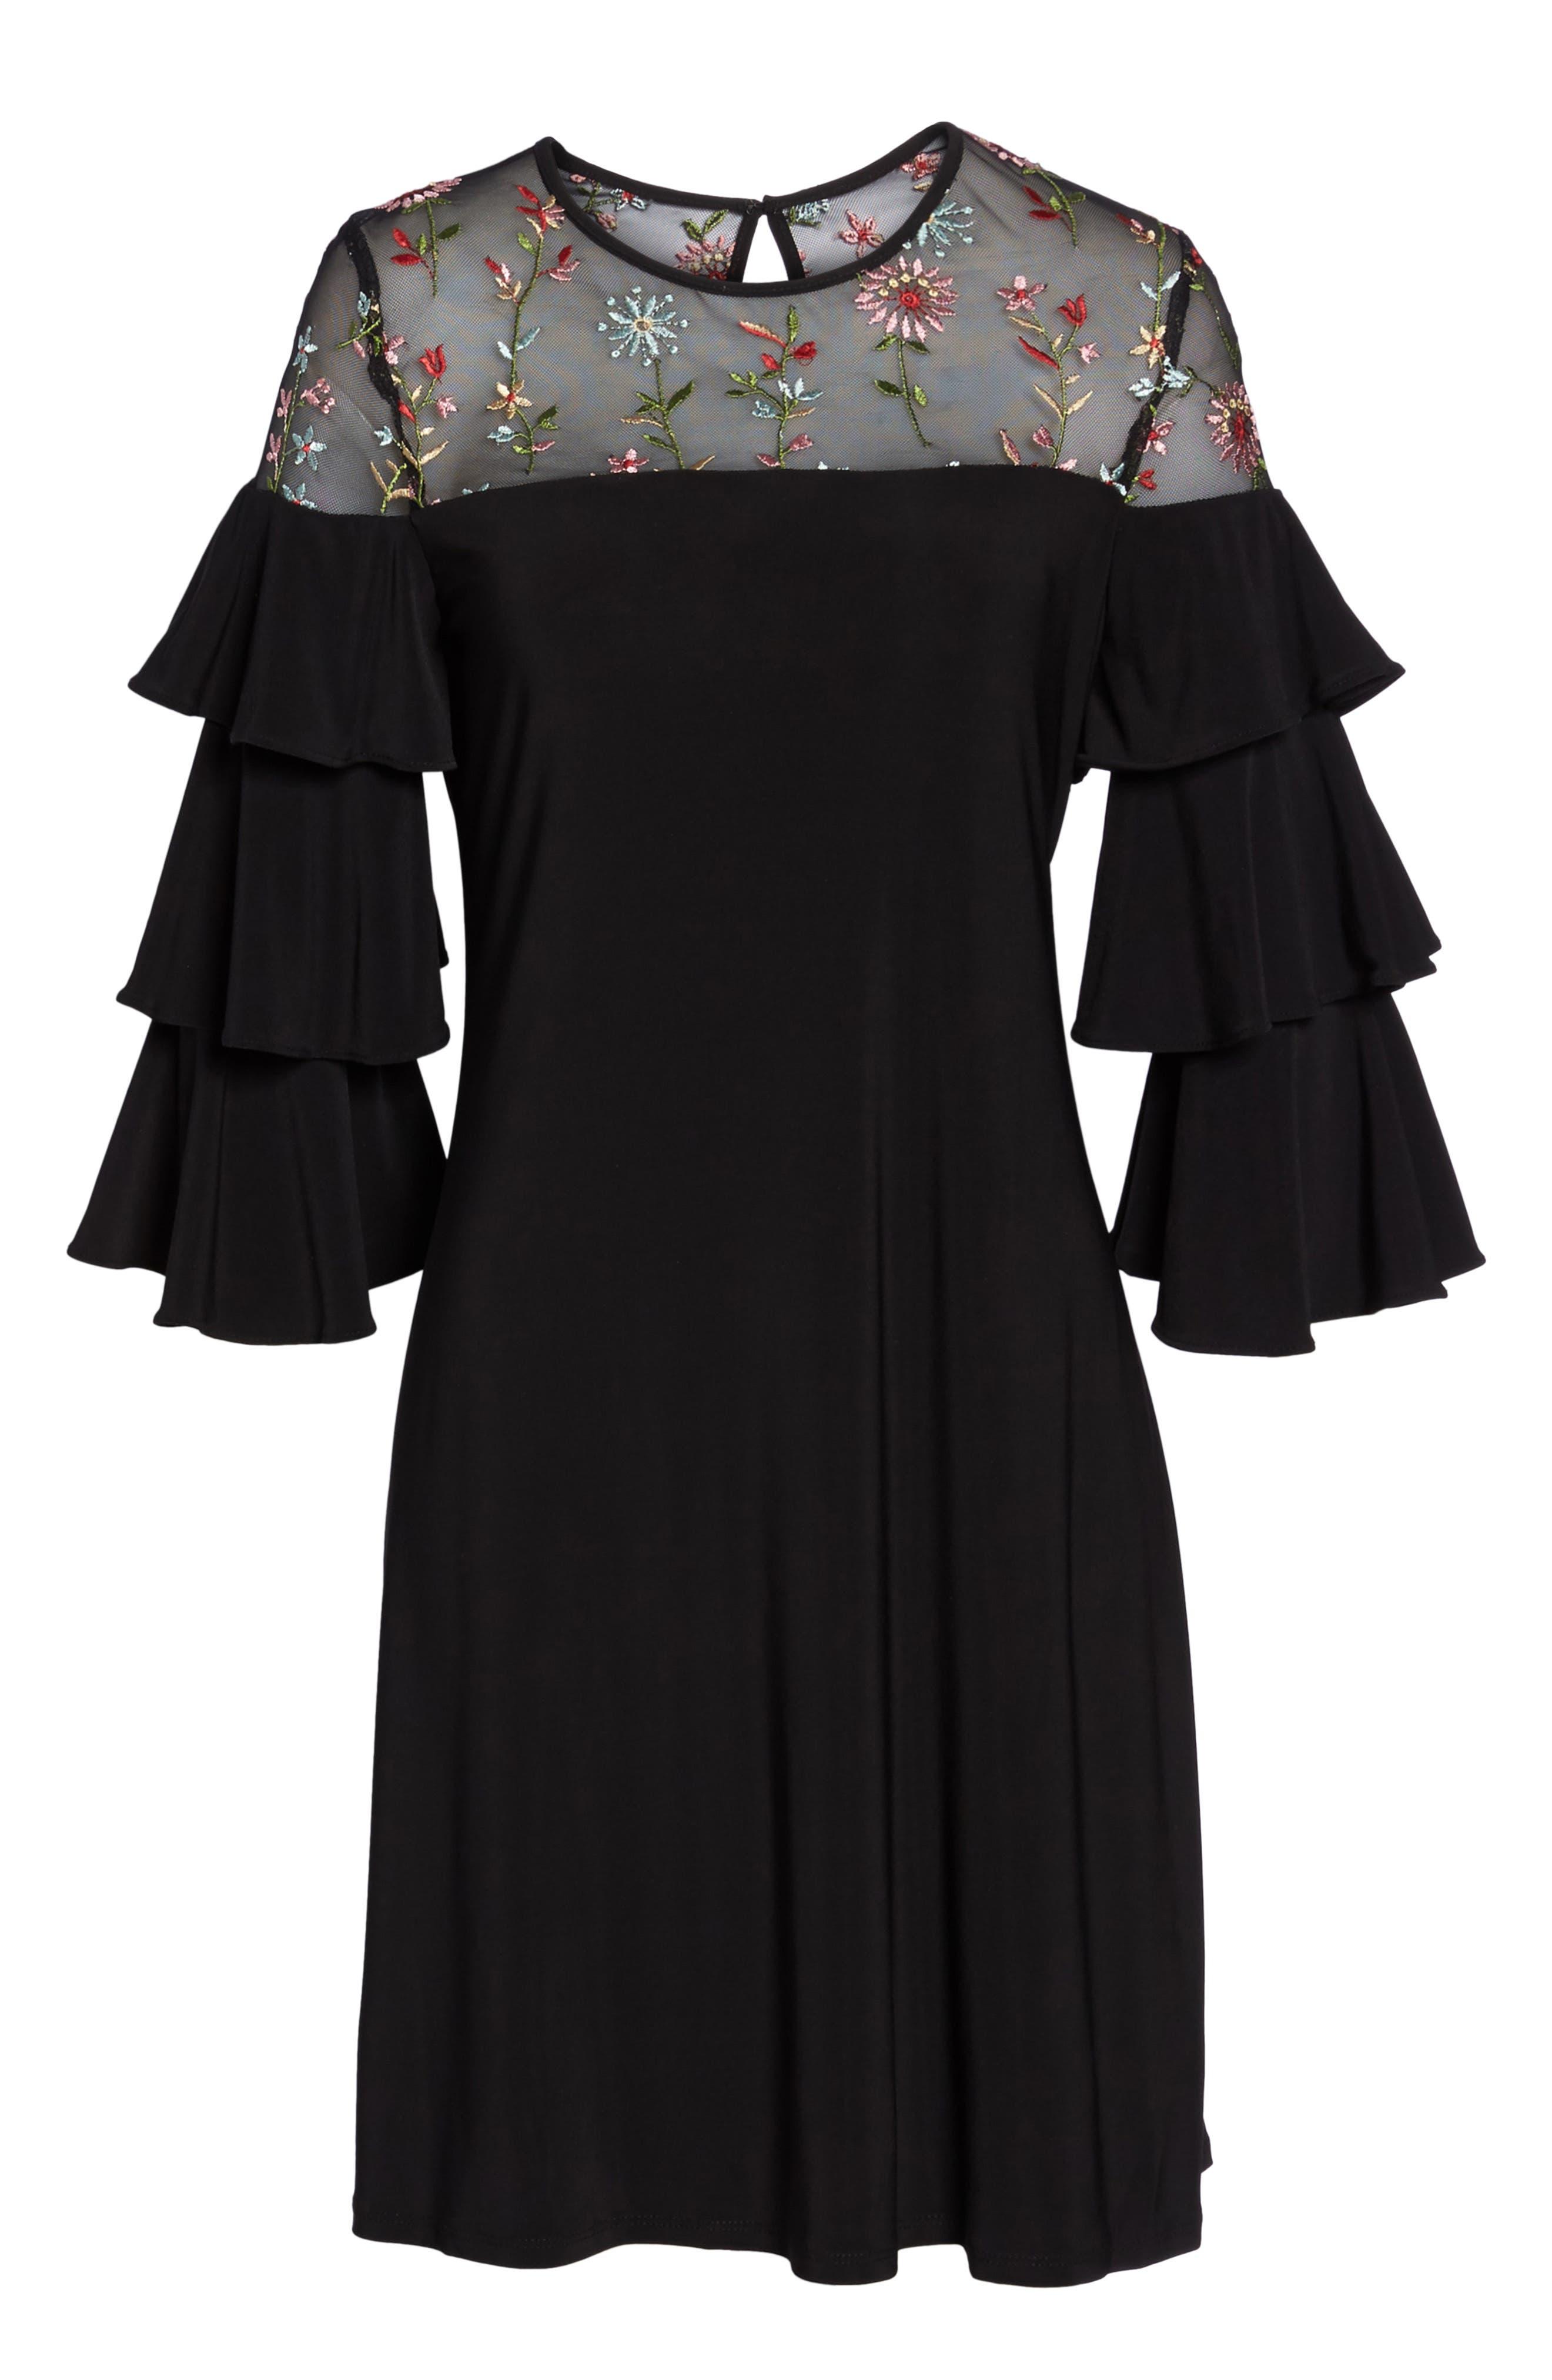 Tiered Sleeve Trapeze Dress,                             Alternate thumbnail 6, color,                             Black Multi